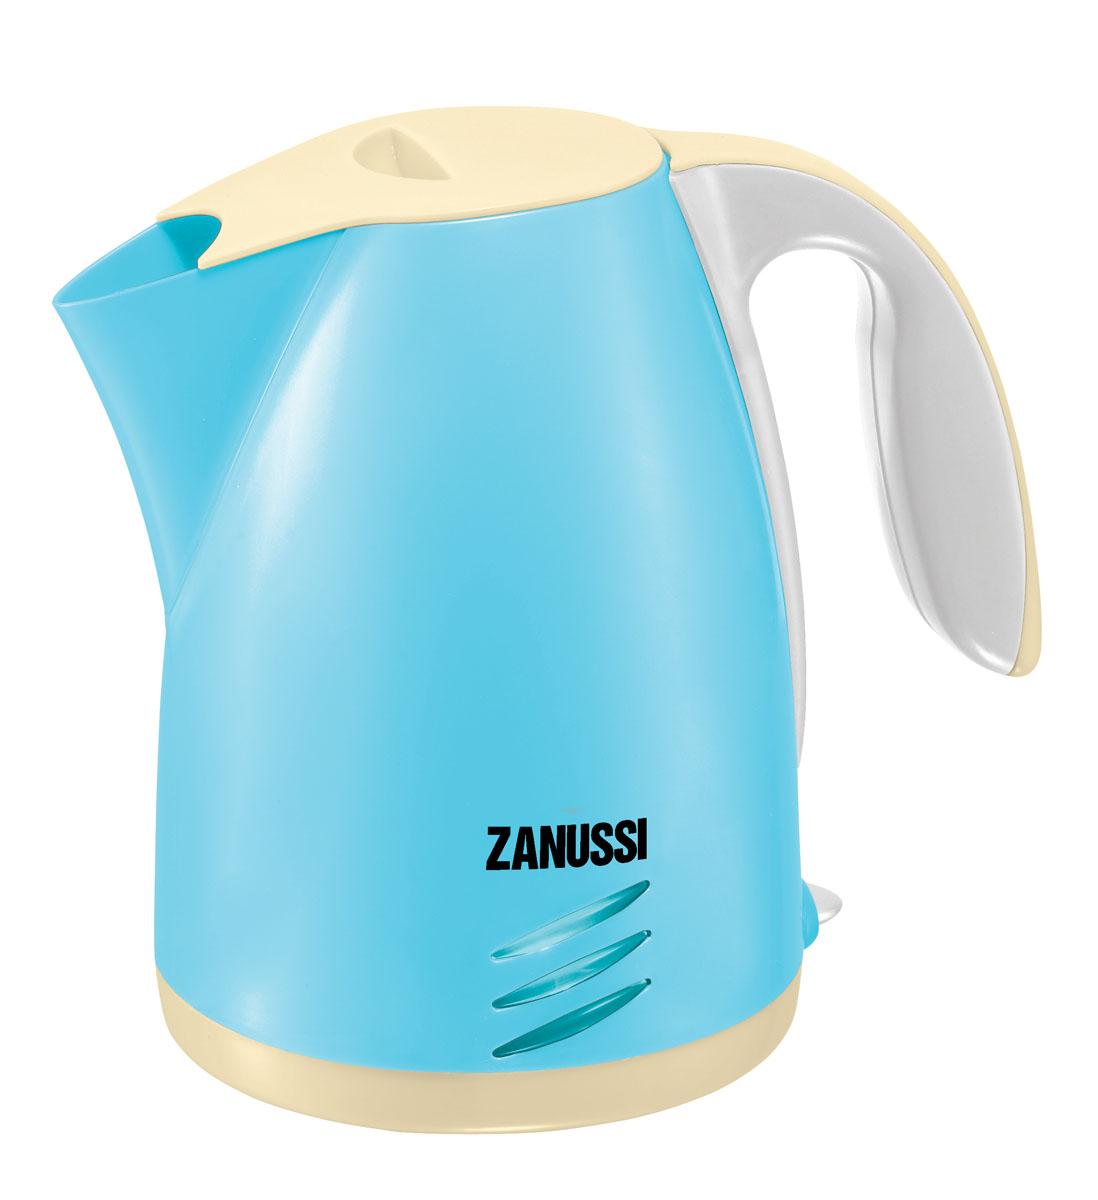 HTI Чайник Zanussi, цвет: голубой, белый, персиковый hti чайничек zanussi